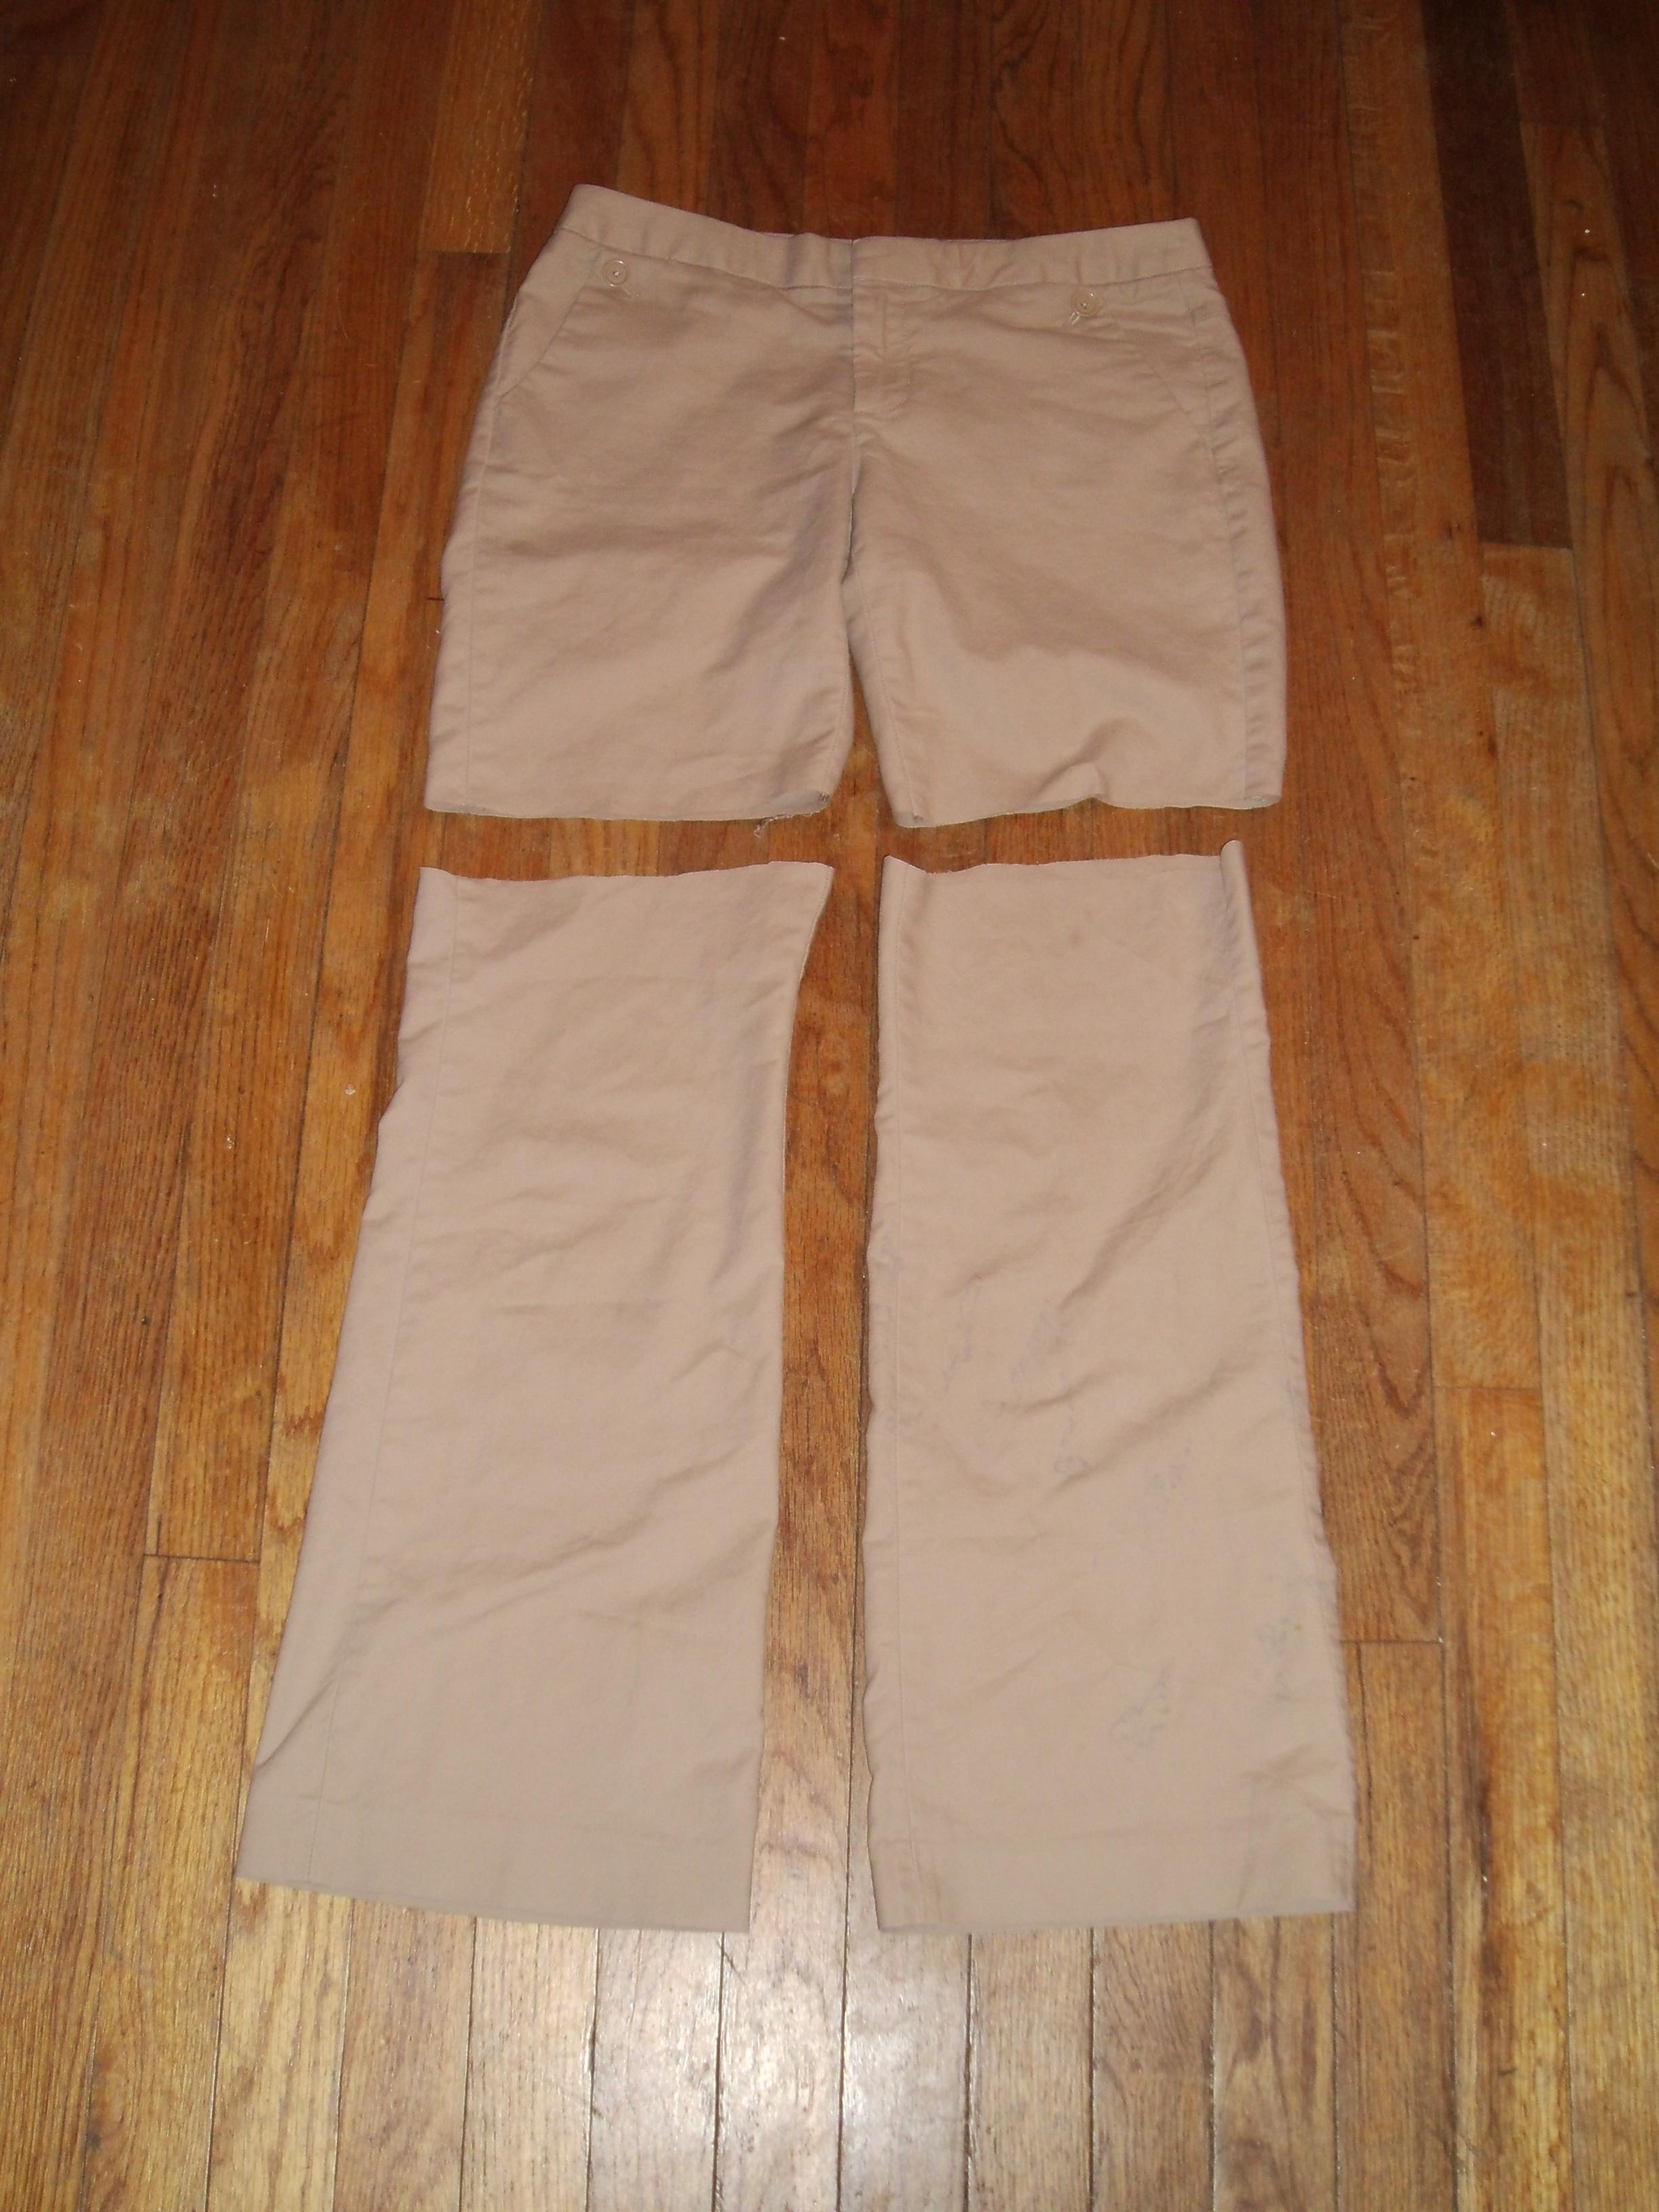 Day 43: Khaki Shorts & A No-Sew Top 3